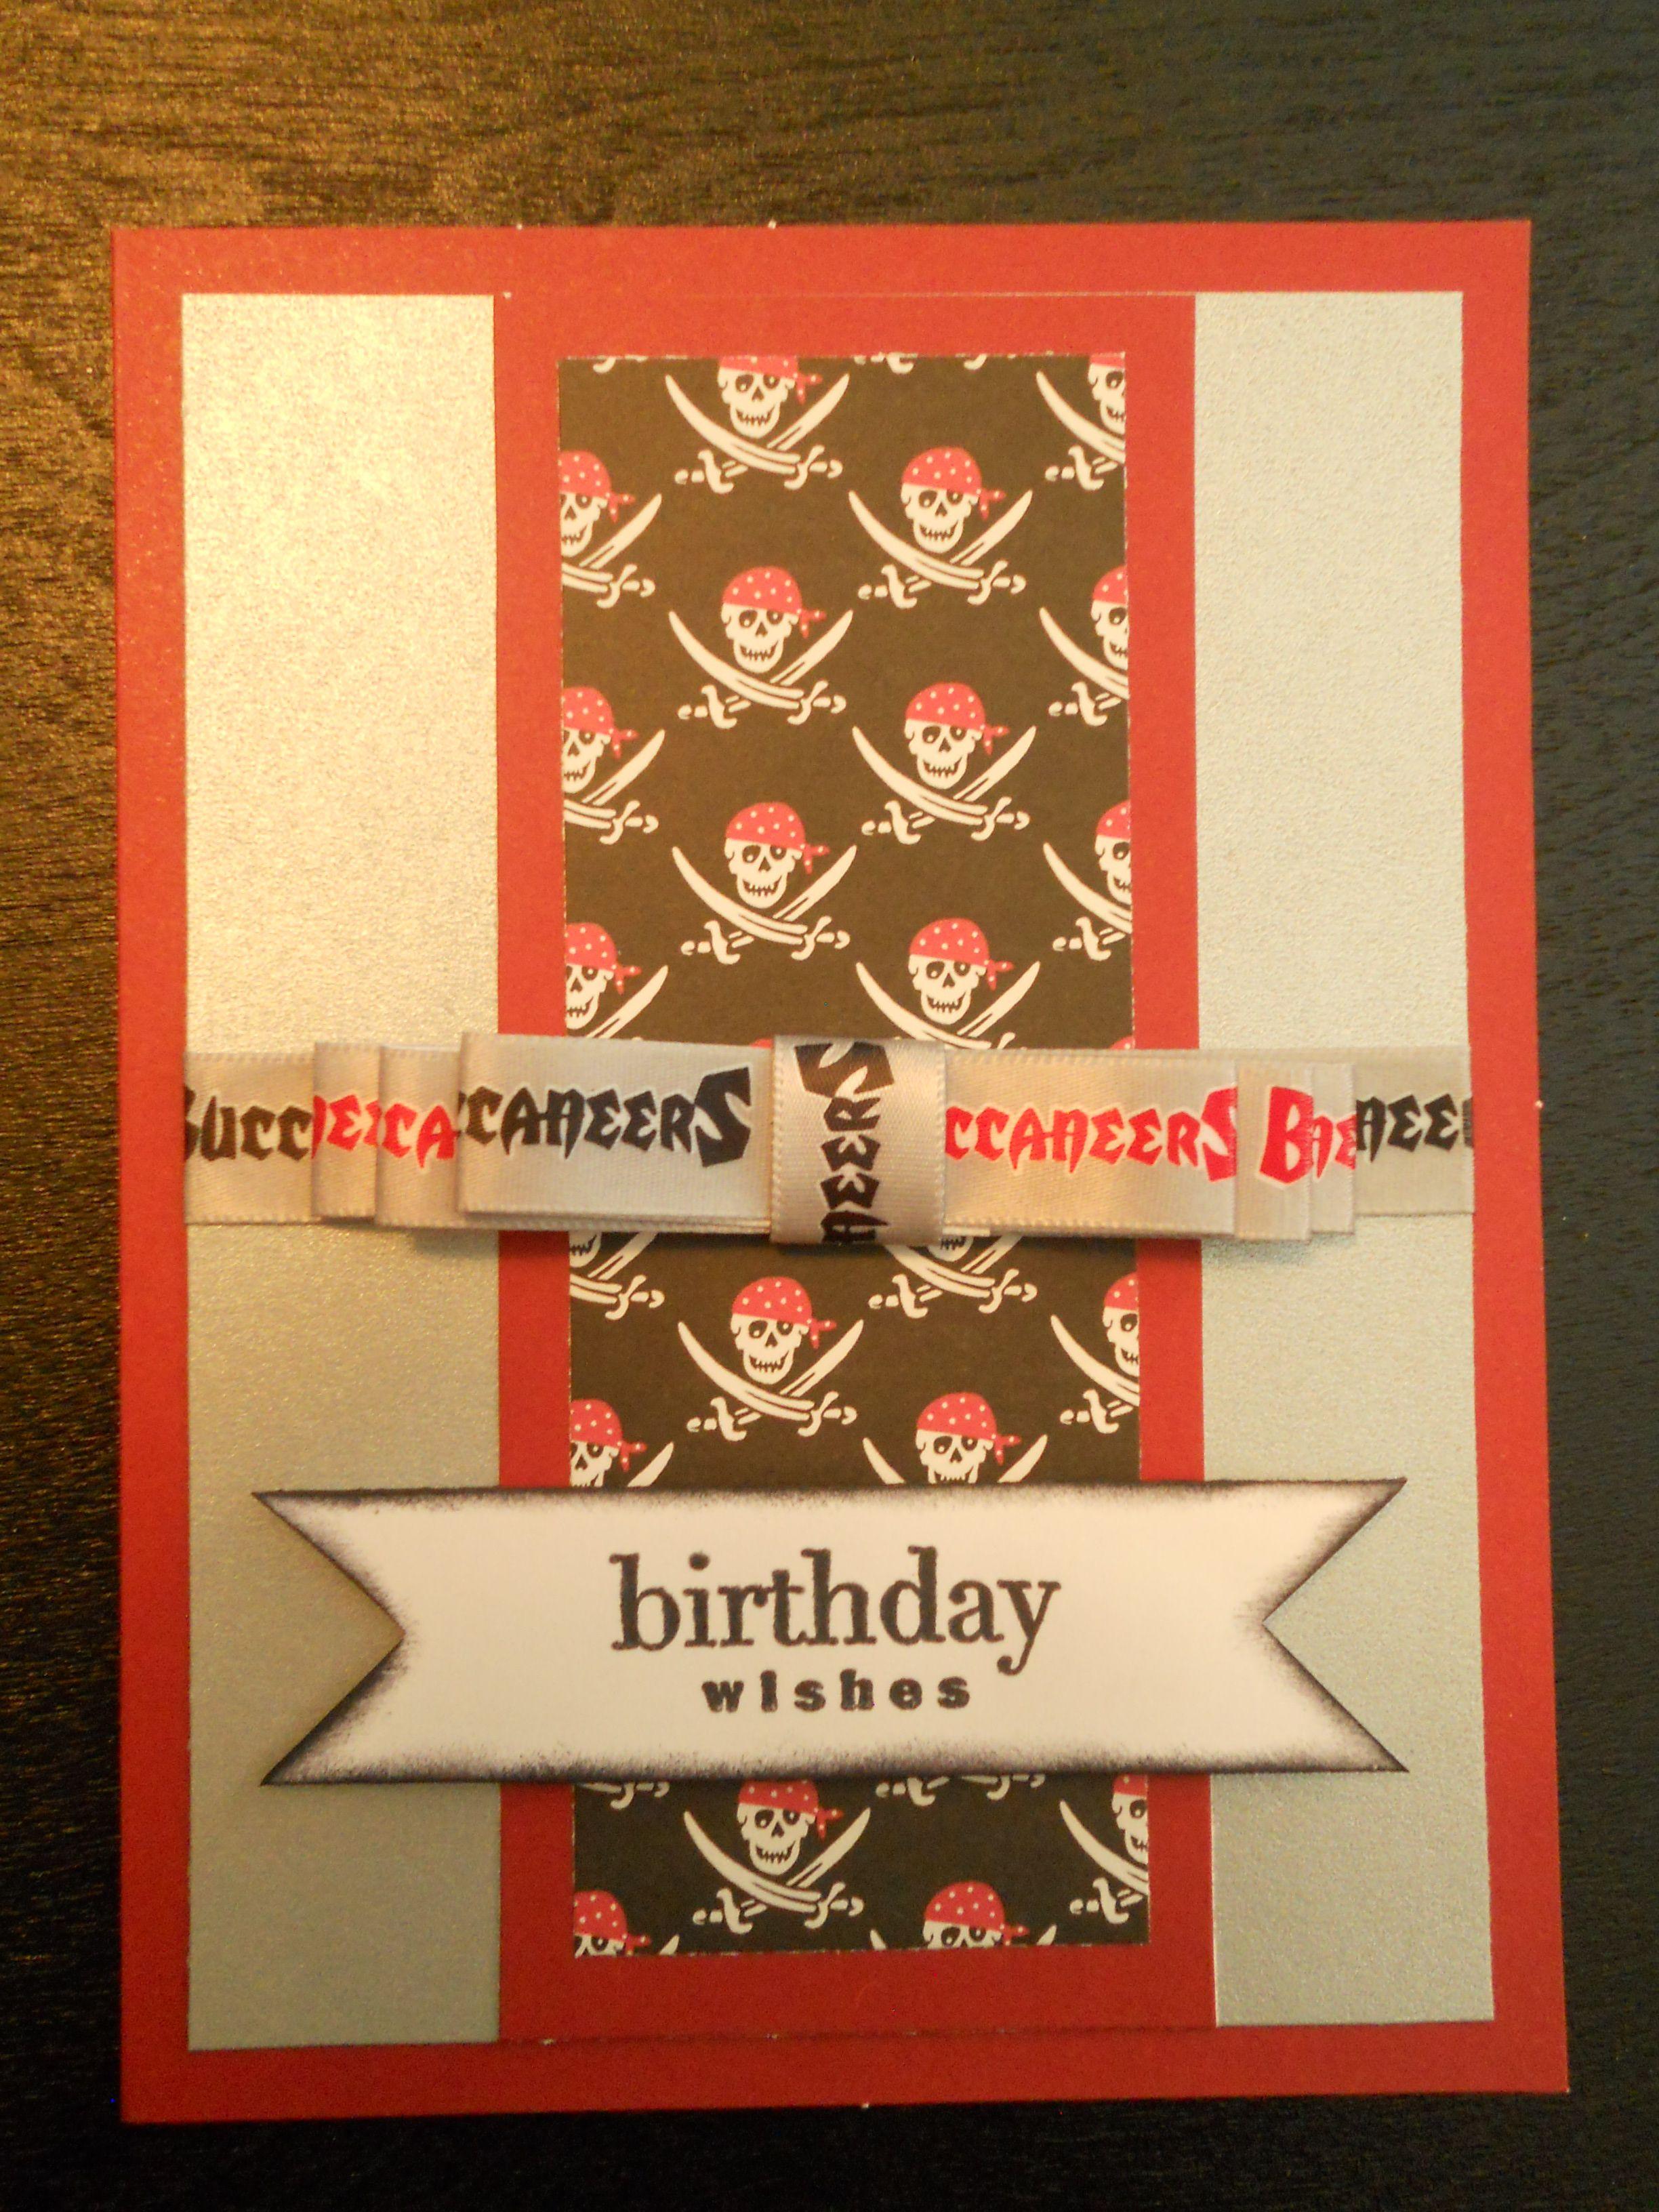 Tampa Bay Buccaneers Fan Birthday Card Birthday Cards Birthday Wishes Birthday